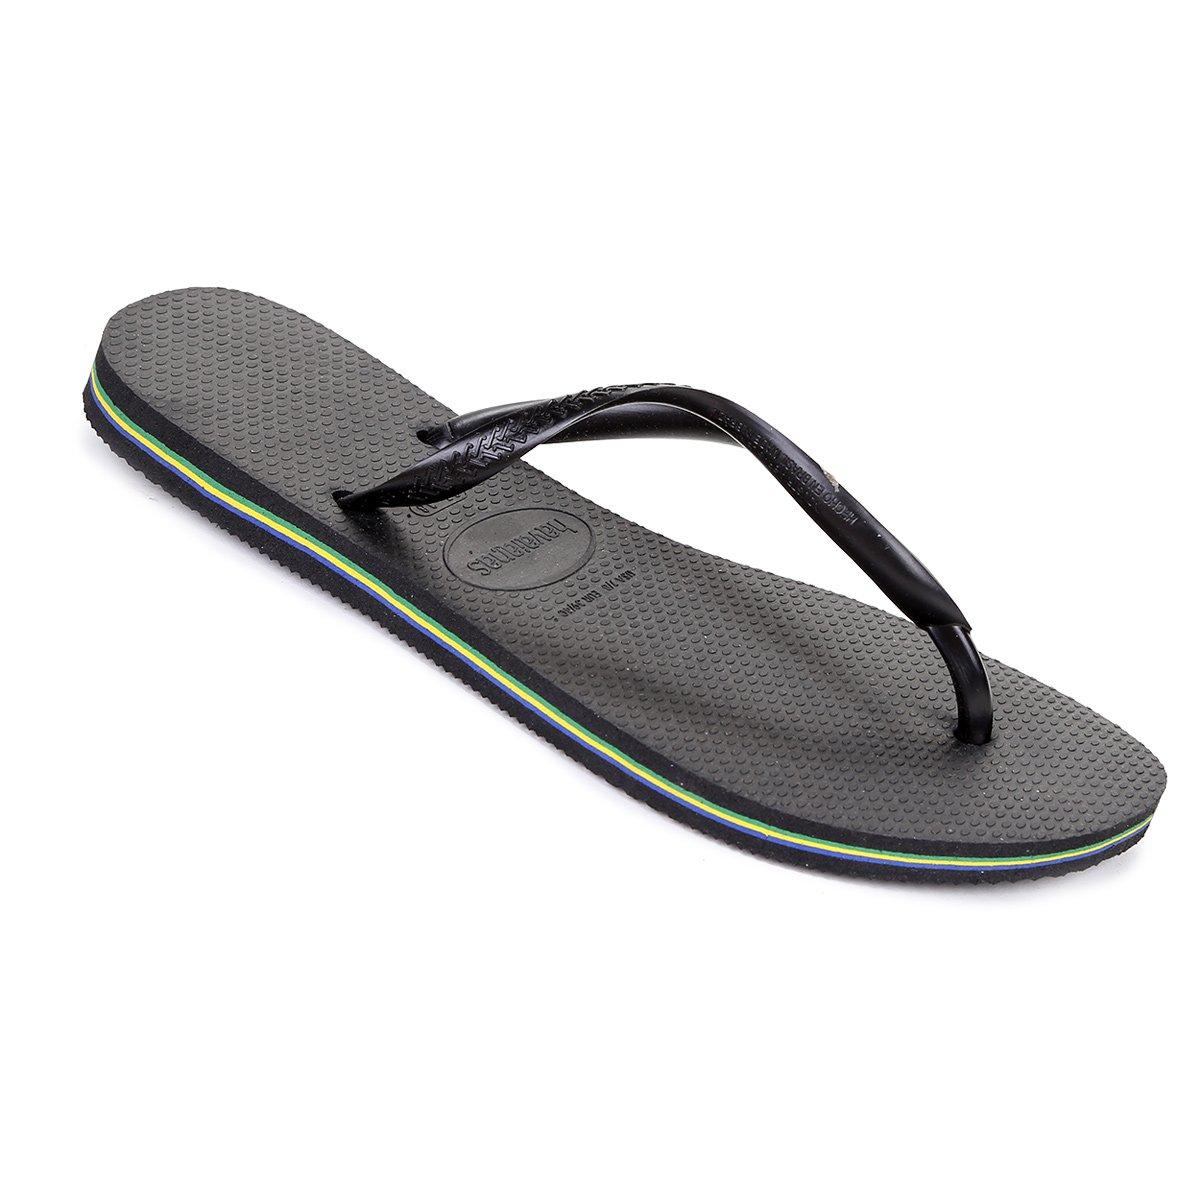 Chinelo Havaianas Slim Brasil Feminino - Preto - Compre Agora  15c39c1a350